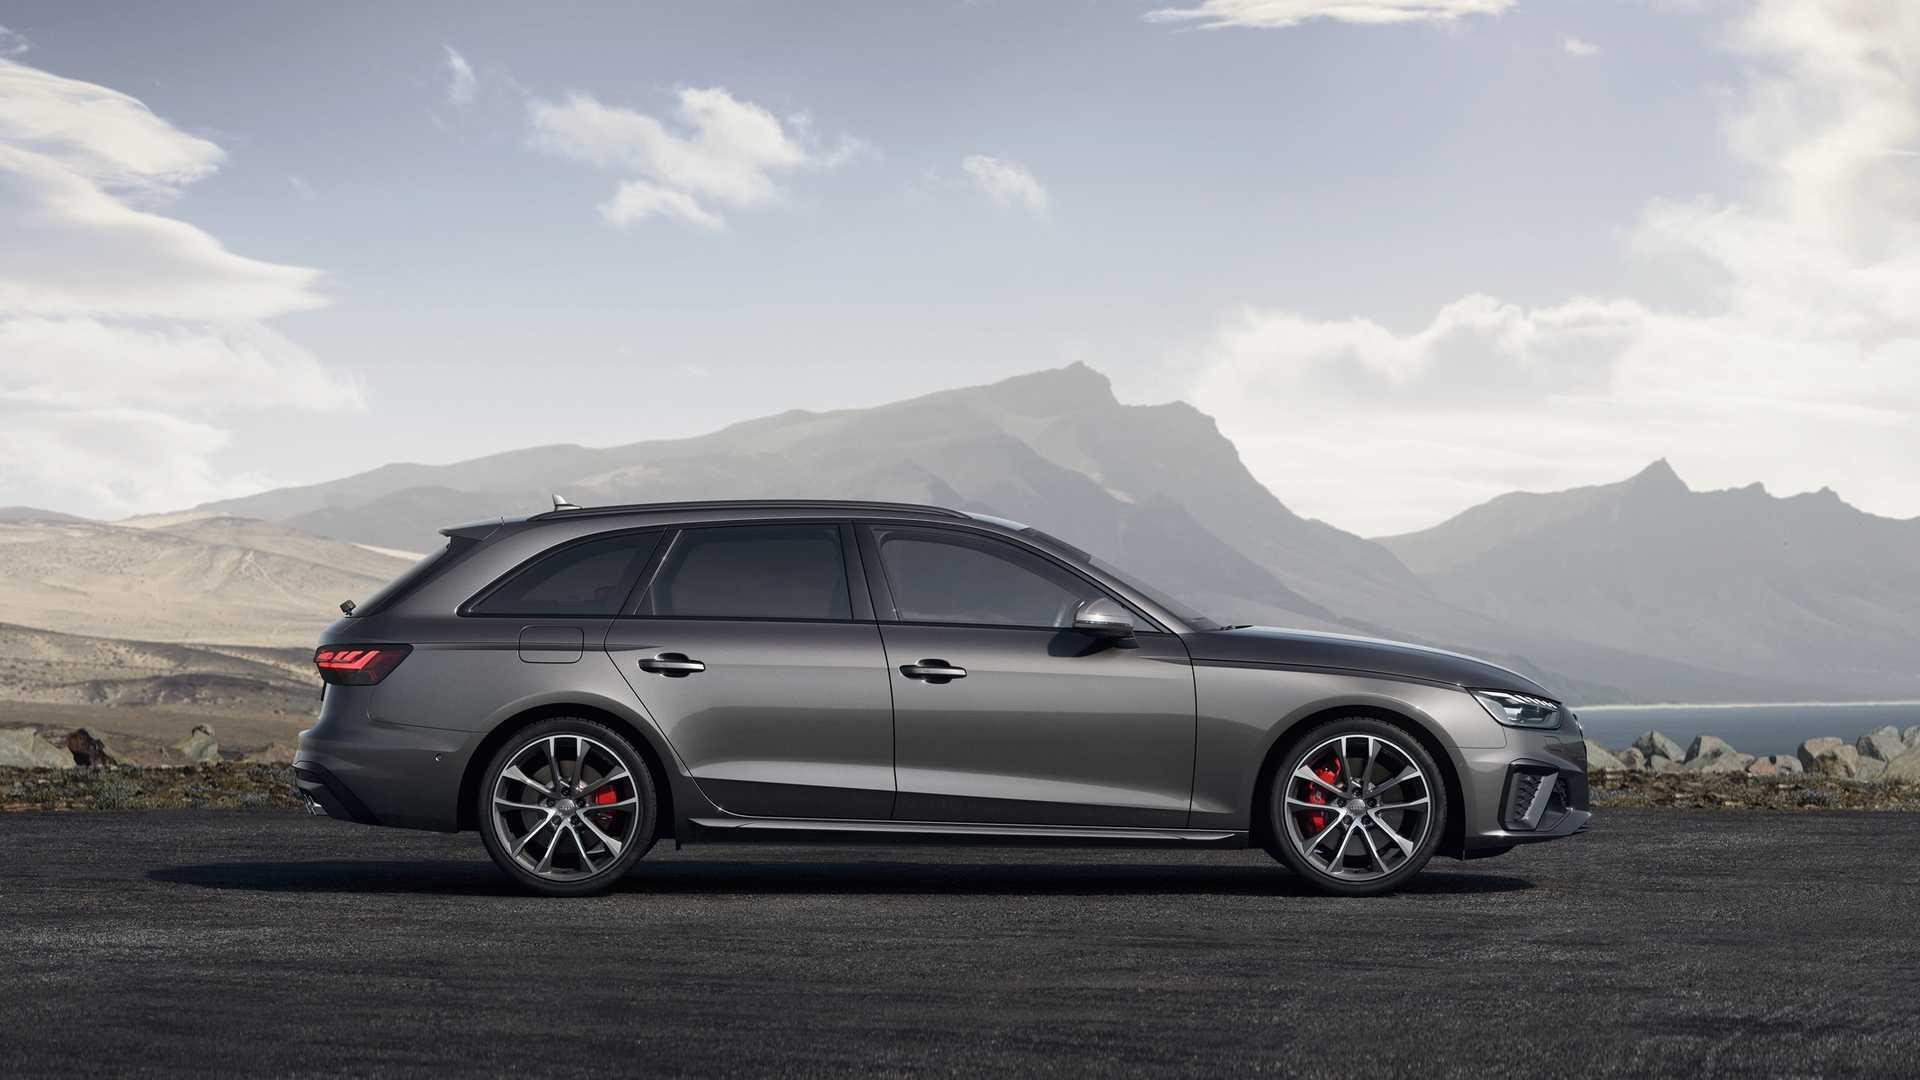 2020 Audi S4 Avant TDI (Color: Daytona Gray) Side Wallpapers (7)